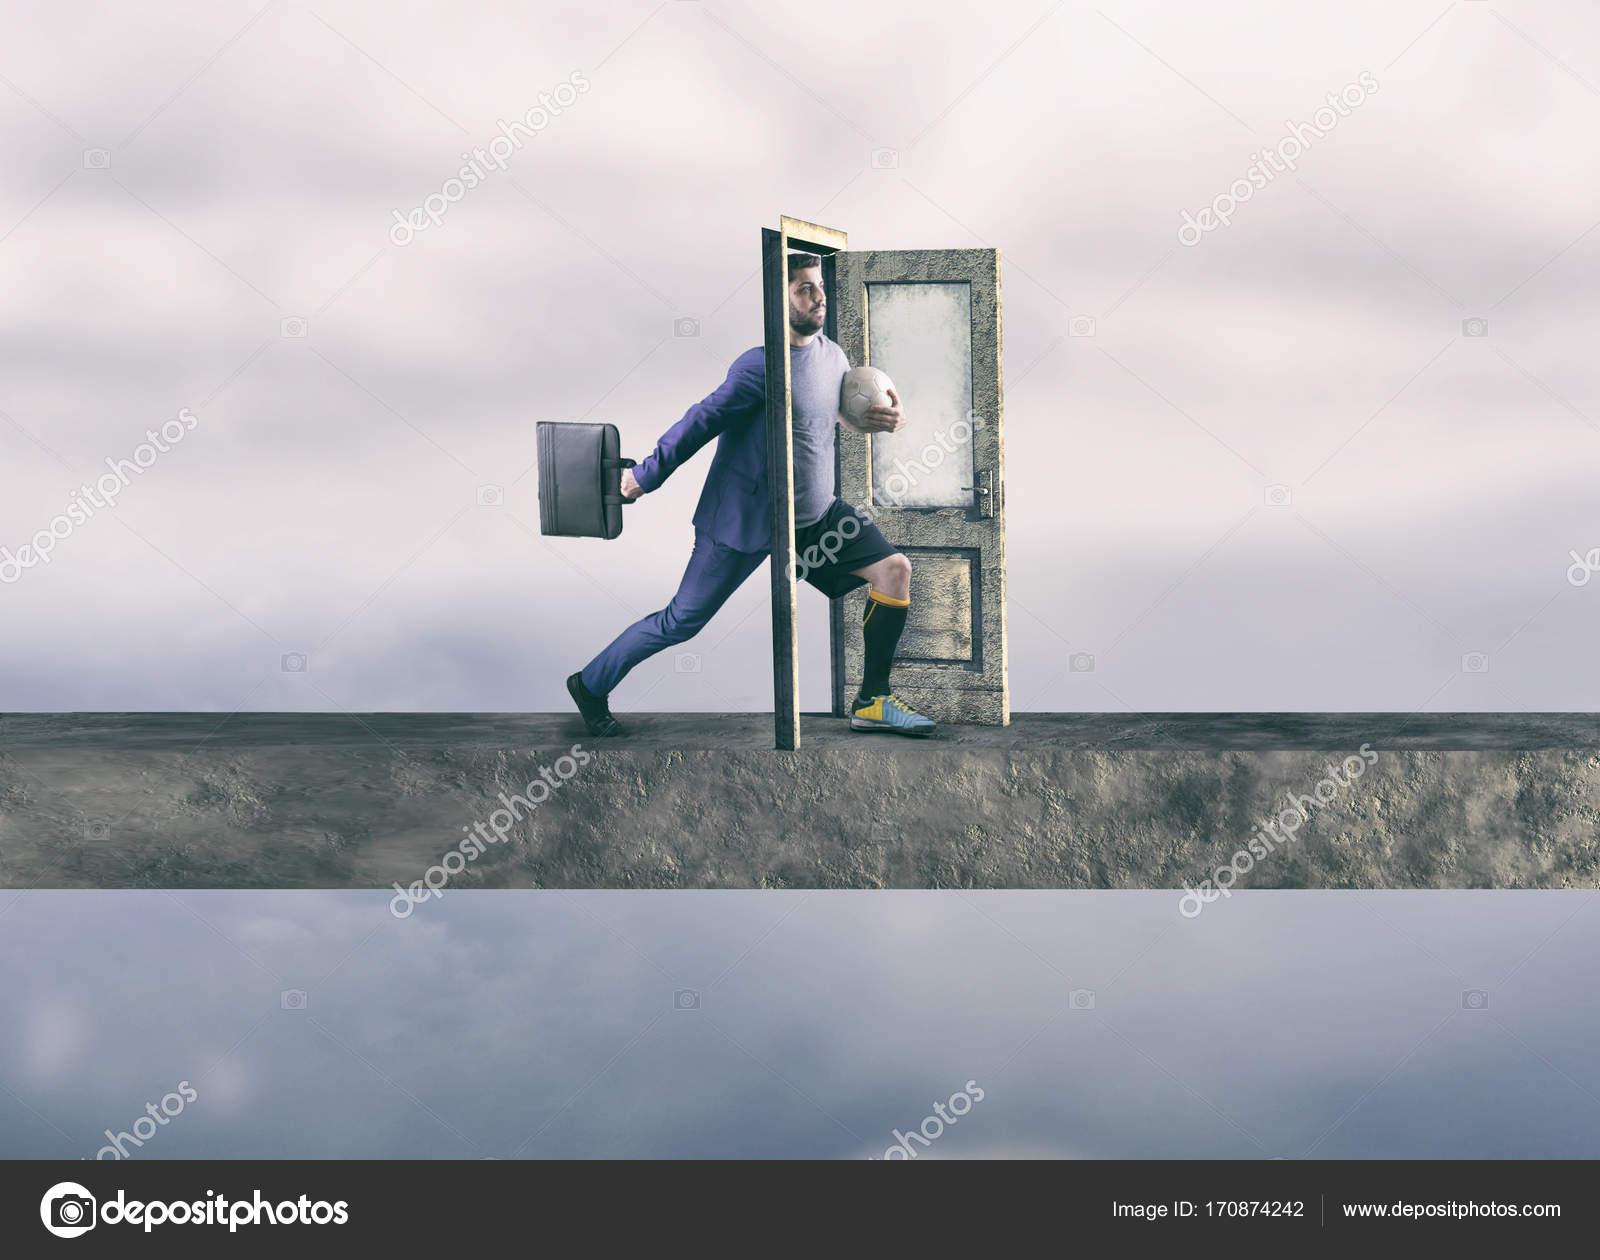 Businessman stepping through door to a soccer player. Half business man half soccer player. u2014 Photo by ALLVISIONN & Stepping through door u2014 Stock Photo © ALLVISIONN #170874242